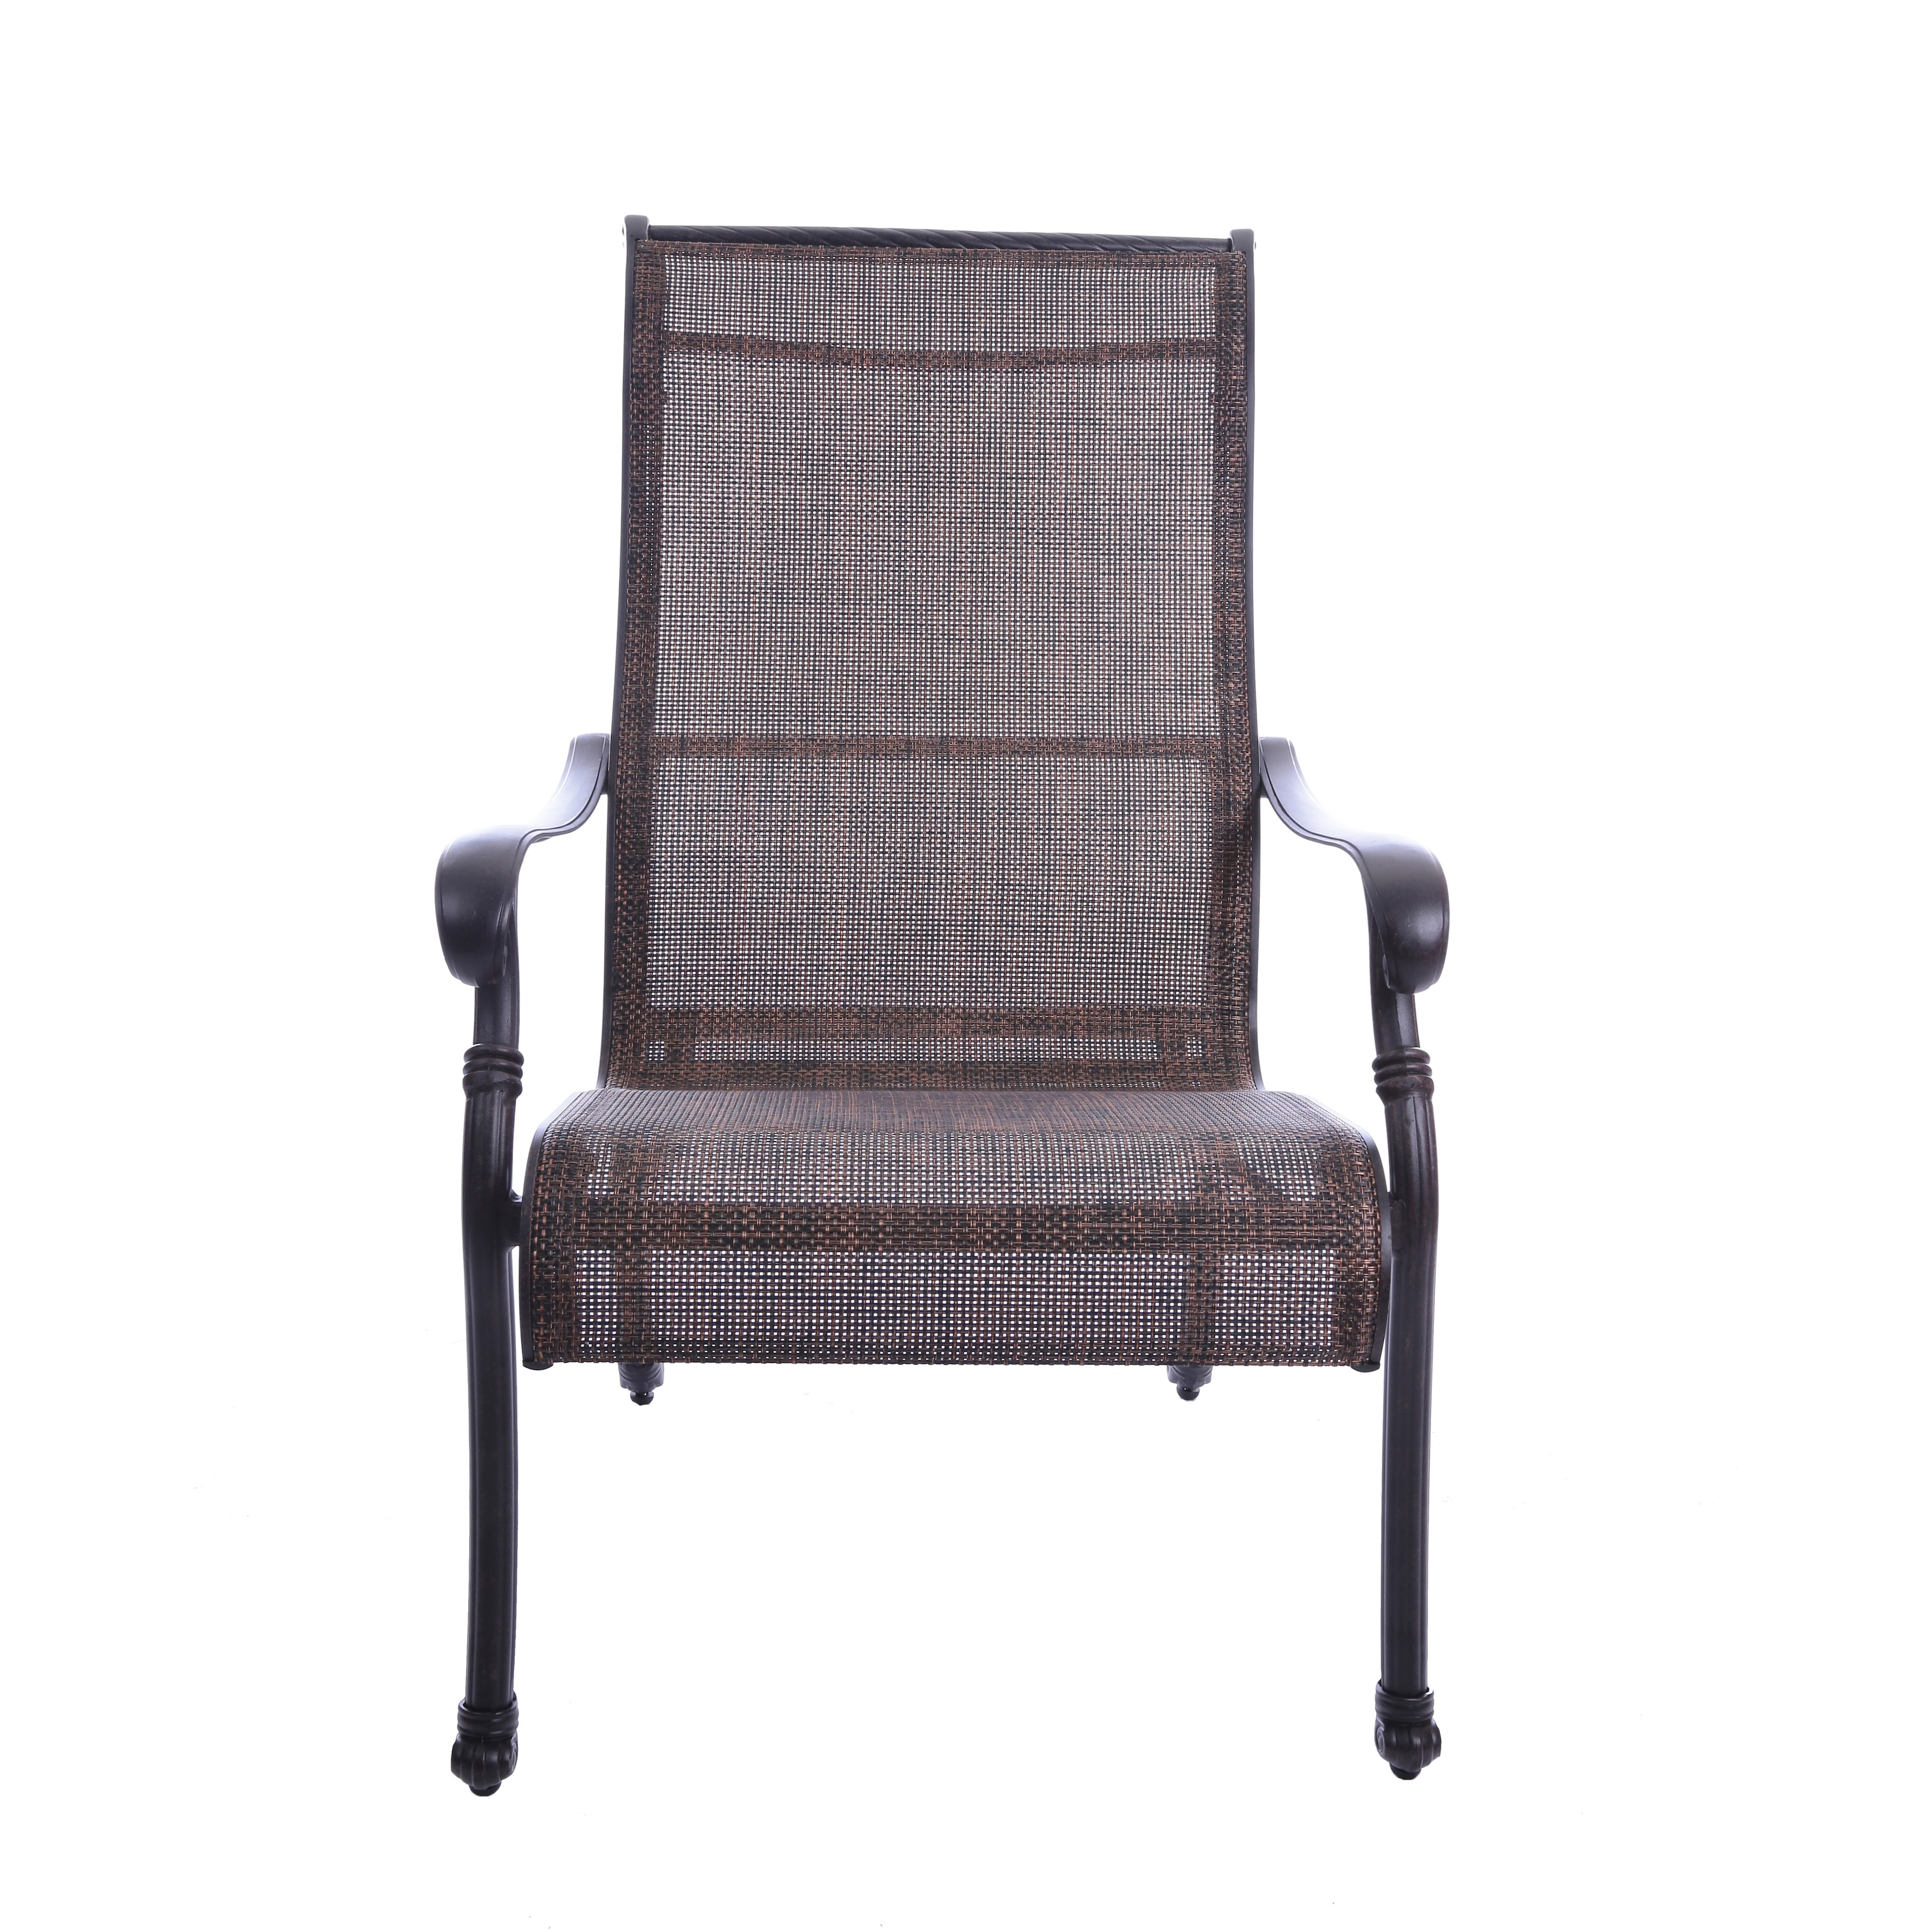 Gathercraft Casa Grande Bronze Outdoor Cast Aluminum Sling Dining Chair Set Of 2 Free Shipping Today 10456556